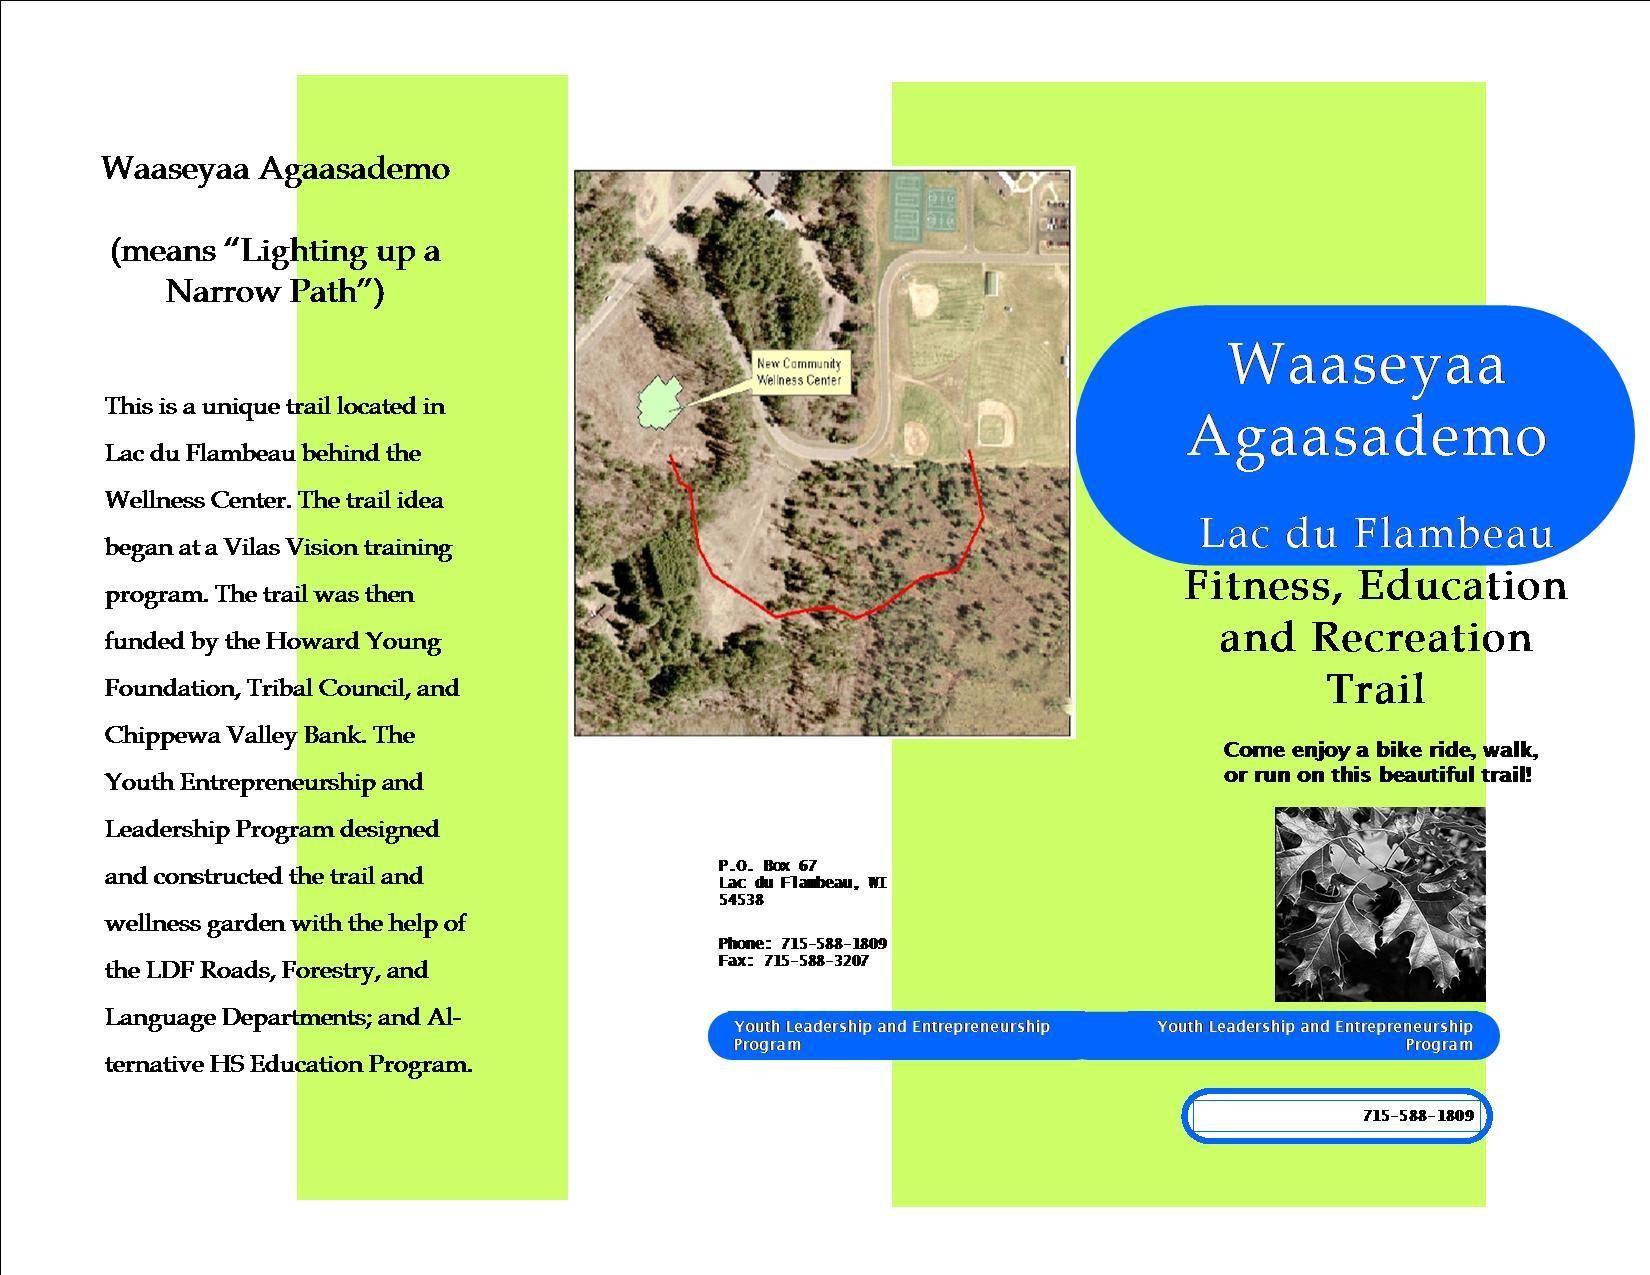 Waaseyaa Lac Du Flambeau Fitness, Education And Recreation Trail Brochure  ...